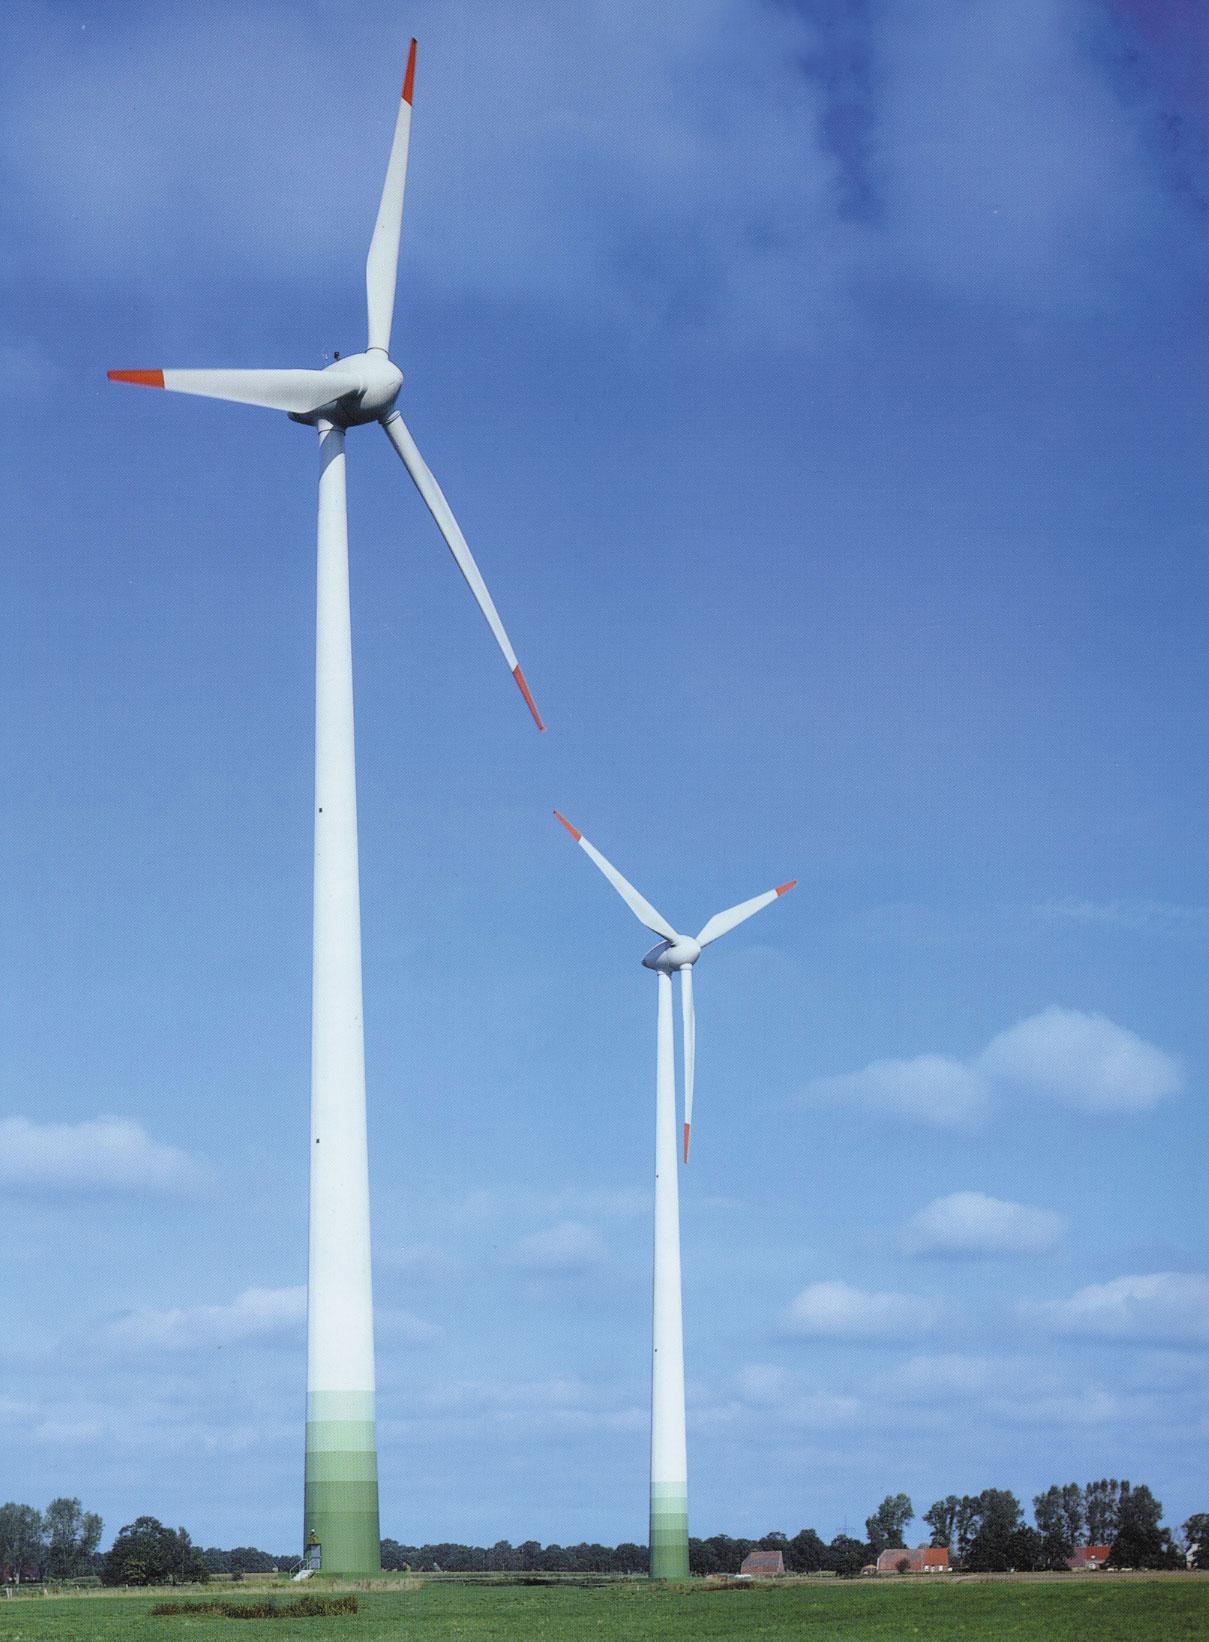 https://dl0.creation.com/articles/p004/c00441/environ-wind-generator